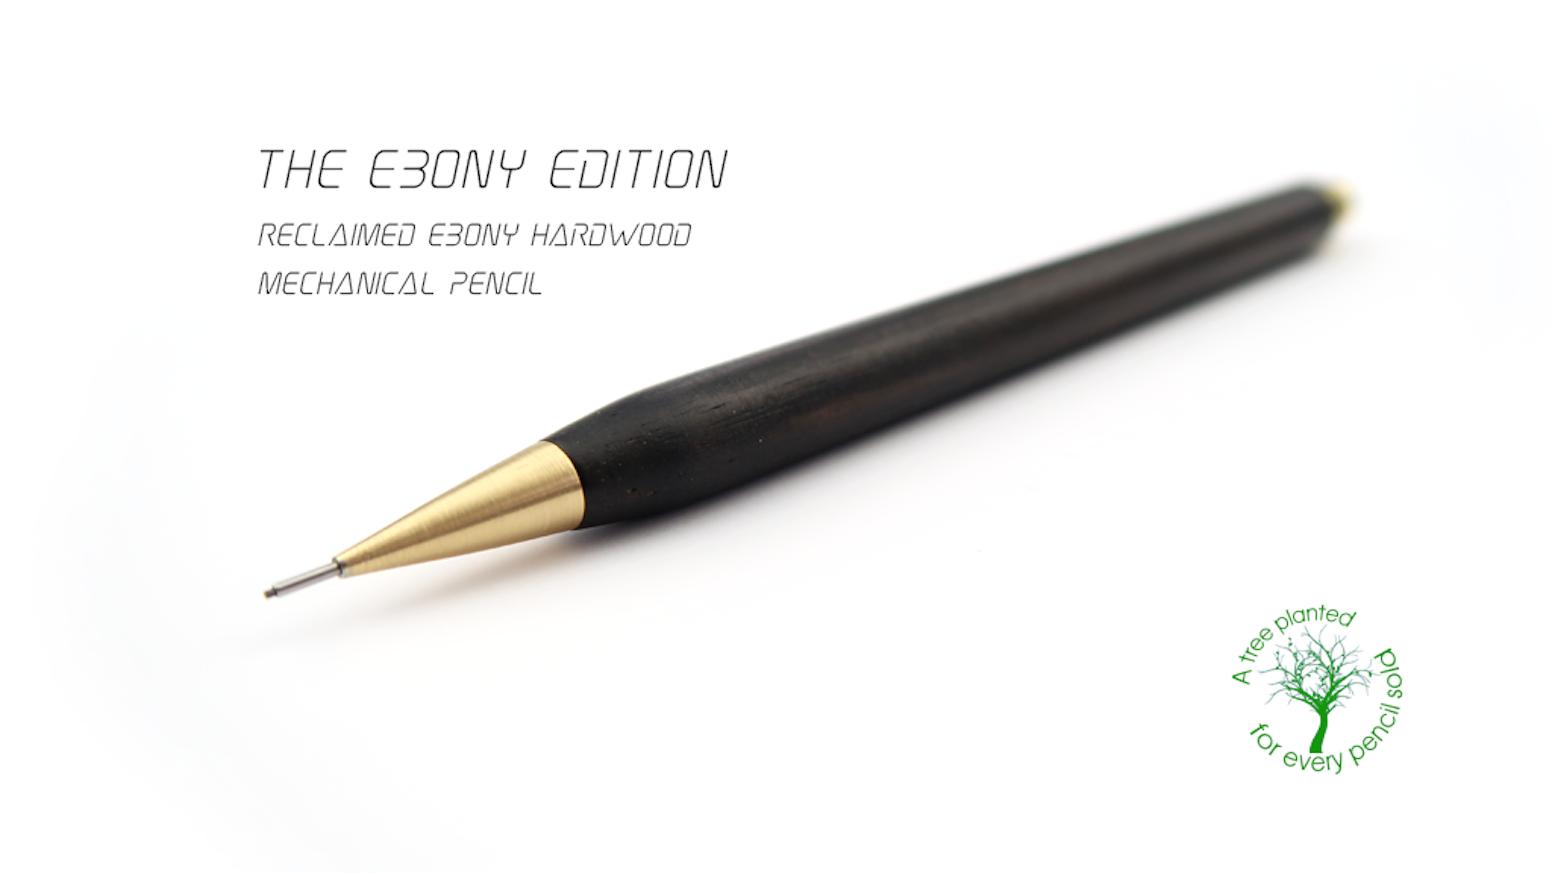 Special edition handmade ebony brass mechanical pencil by nicholas